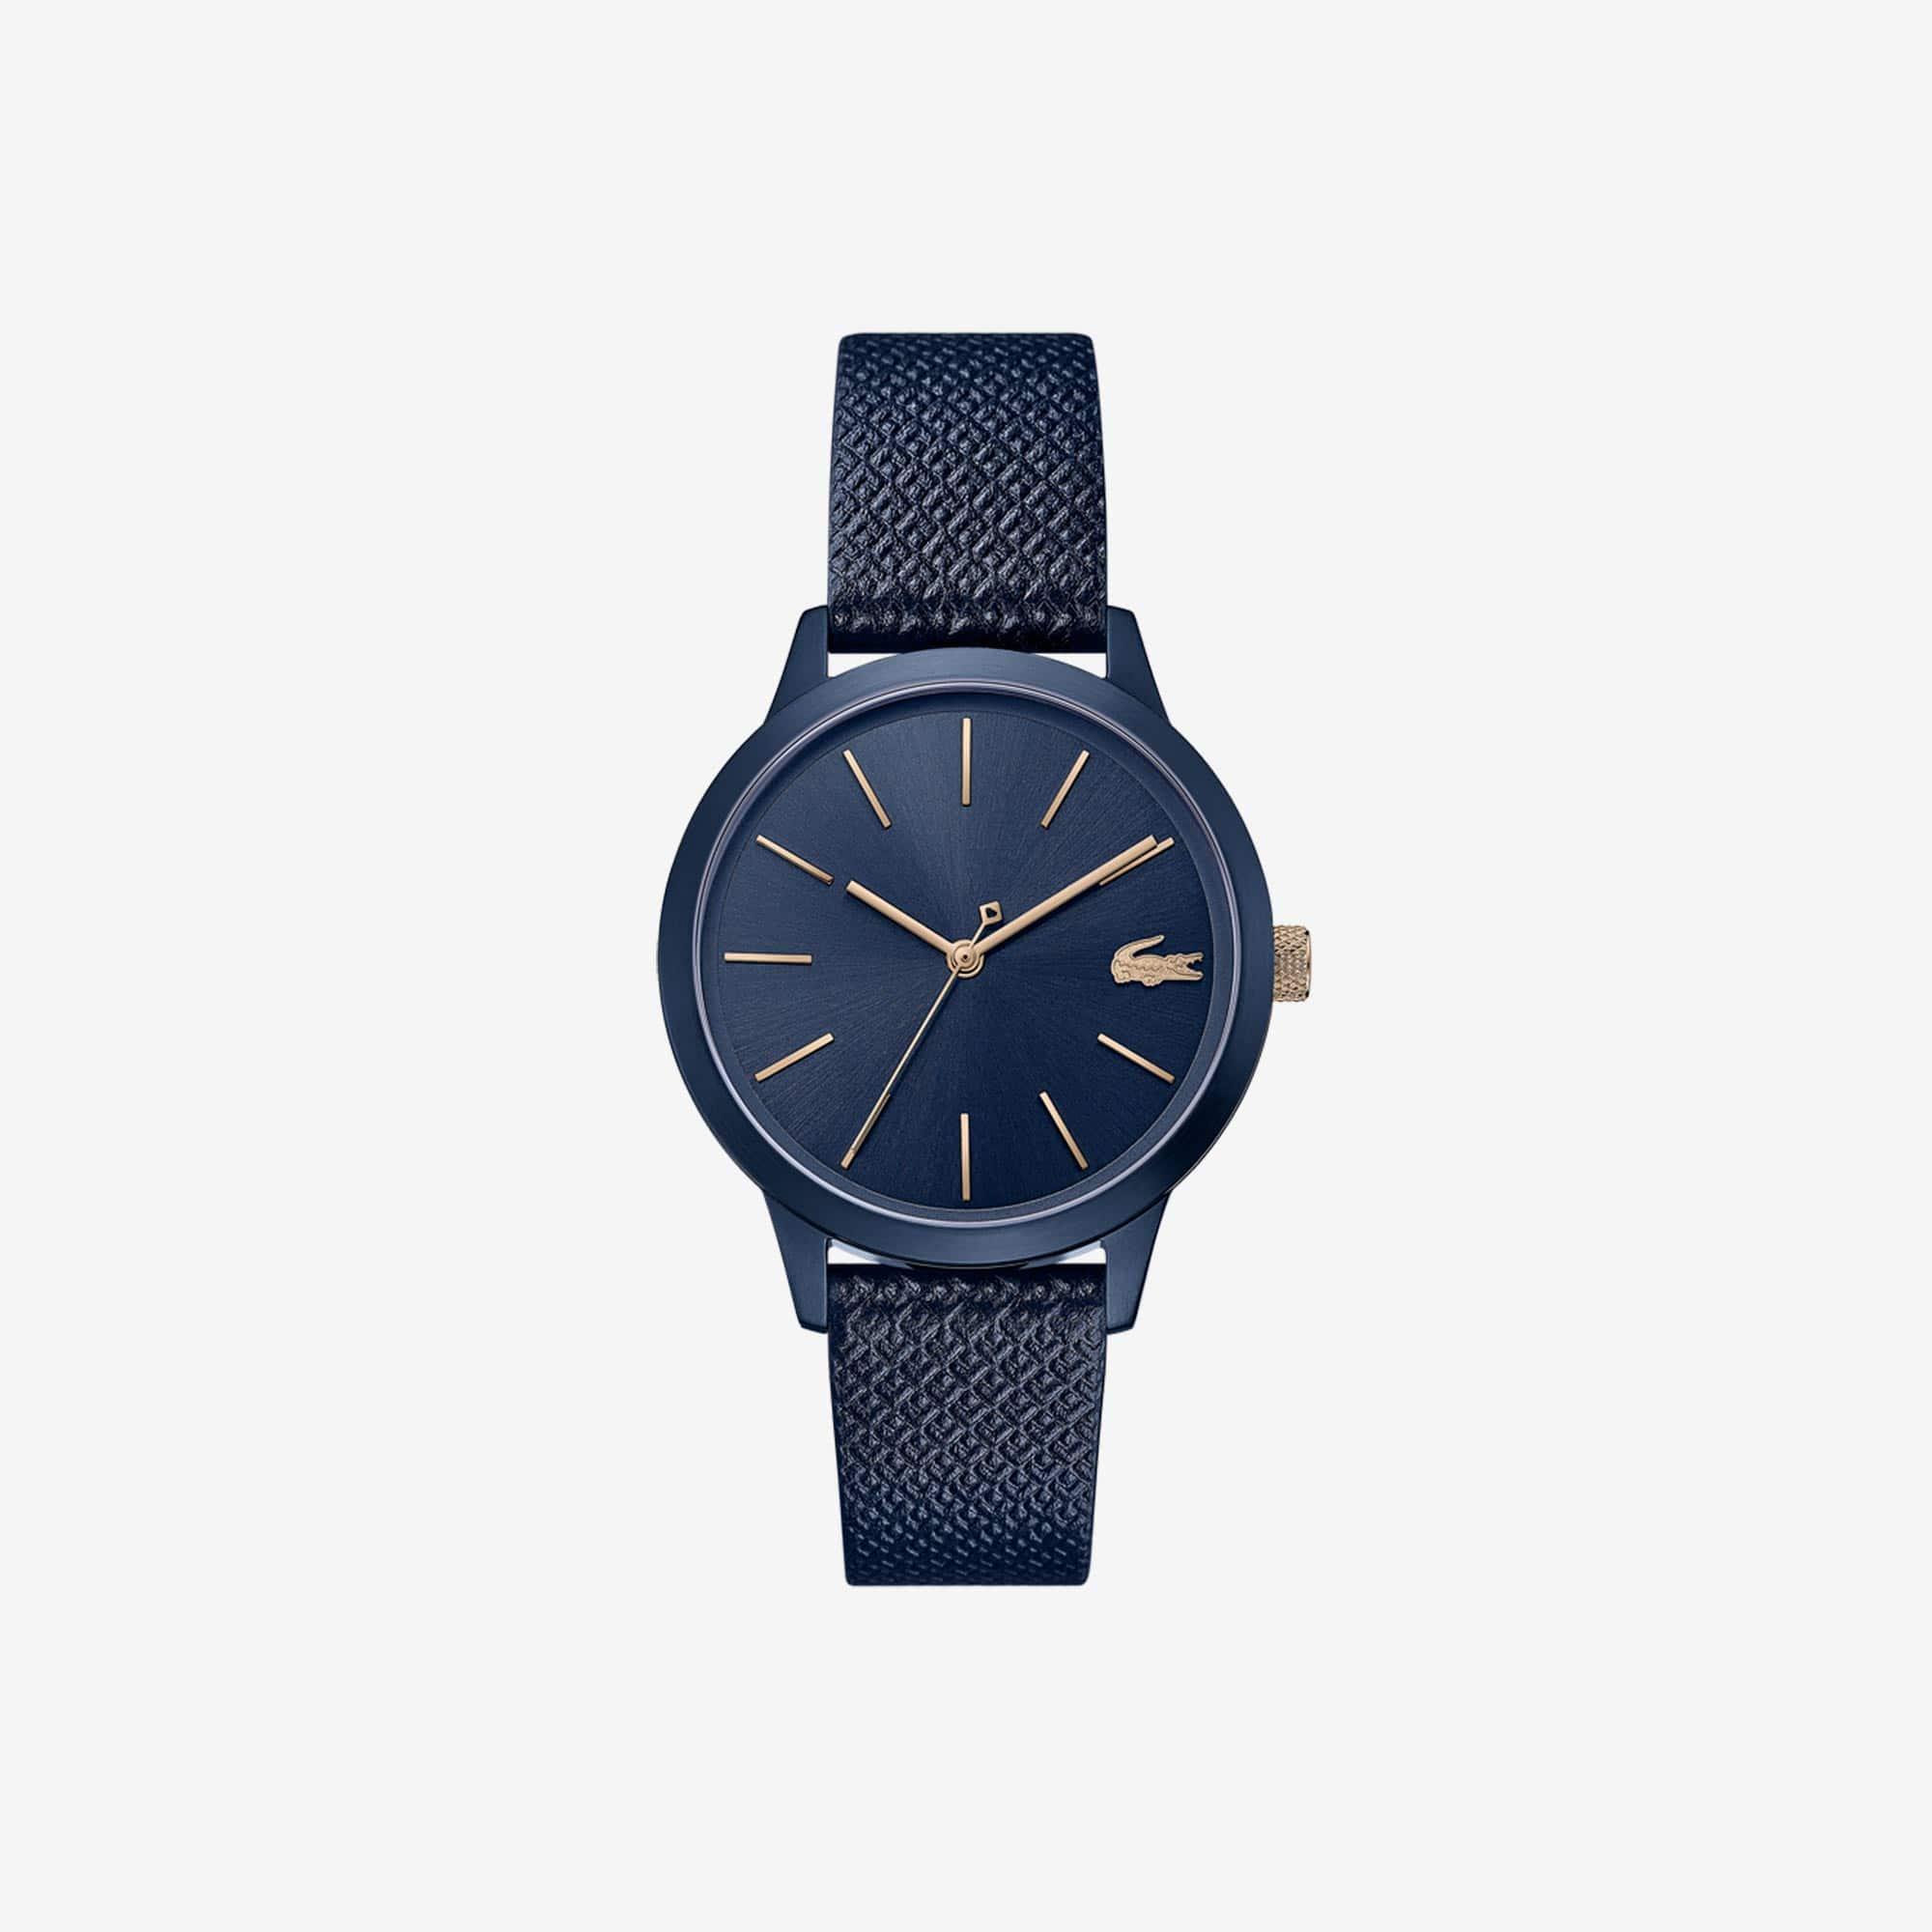 Damen LACOSTE 12.12 Premium-Uhr mit blauem Lederband mit eingeprägtem Petit Piqué Muster